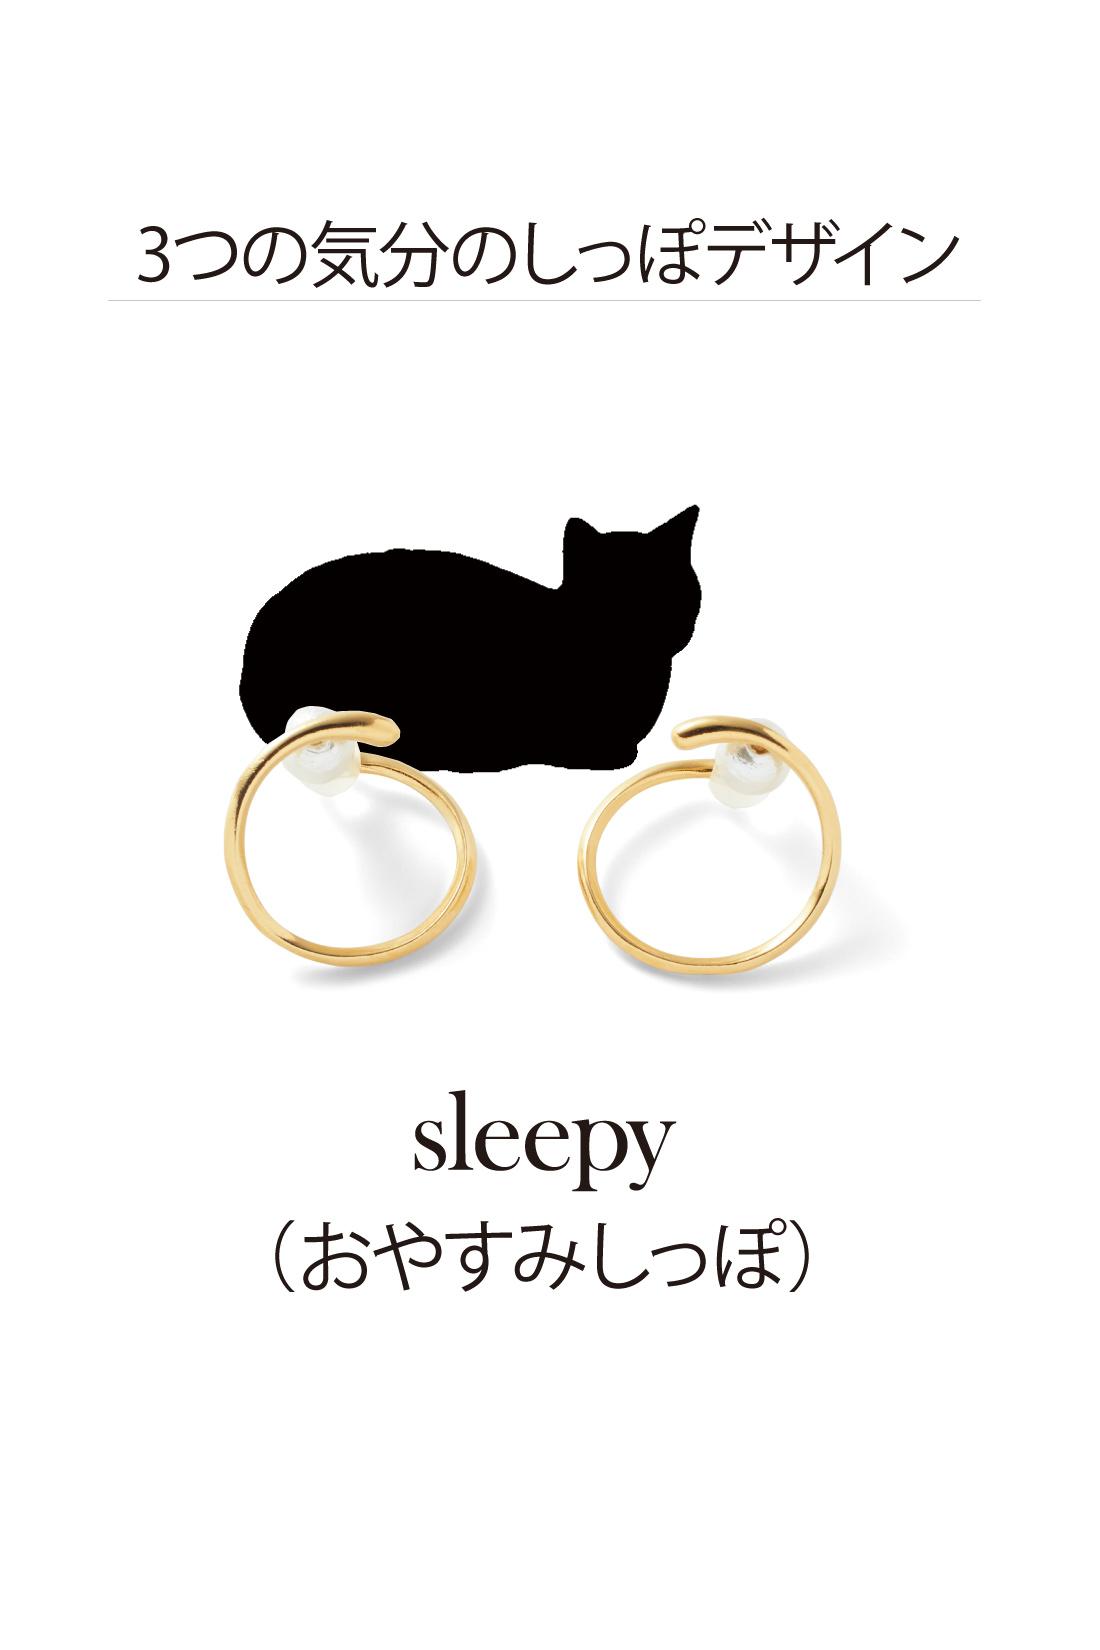 sleepy 〈おやすみしっぽ〉